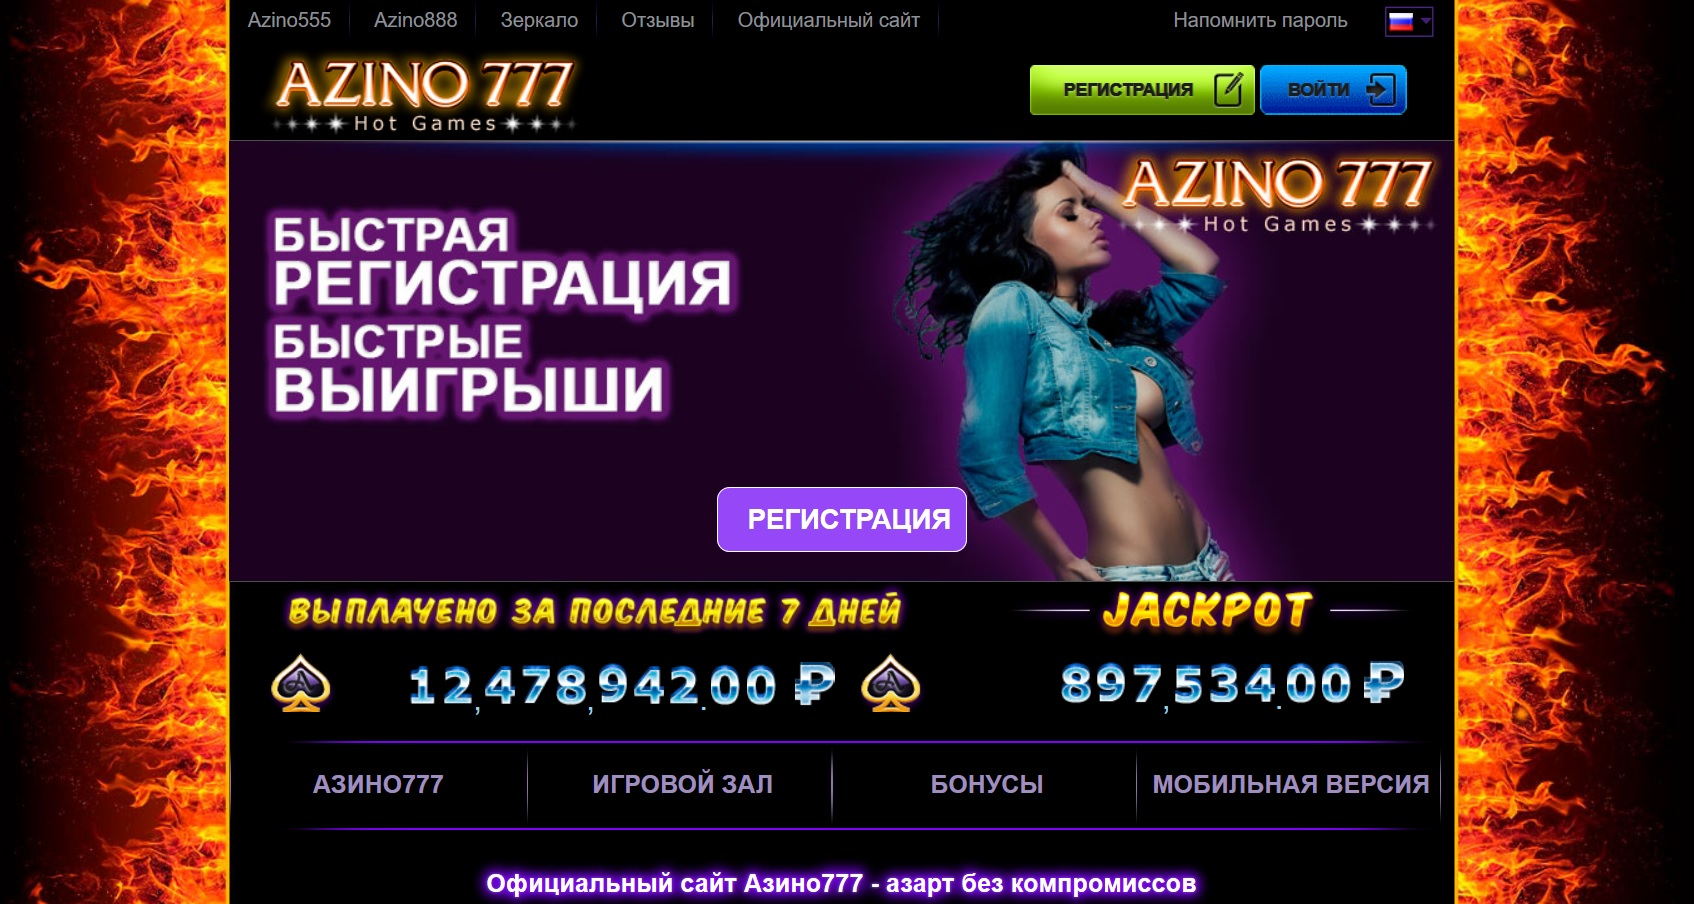 официальный сайт azino888 mobile зеркало